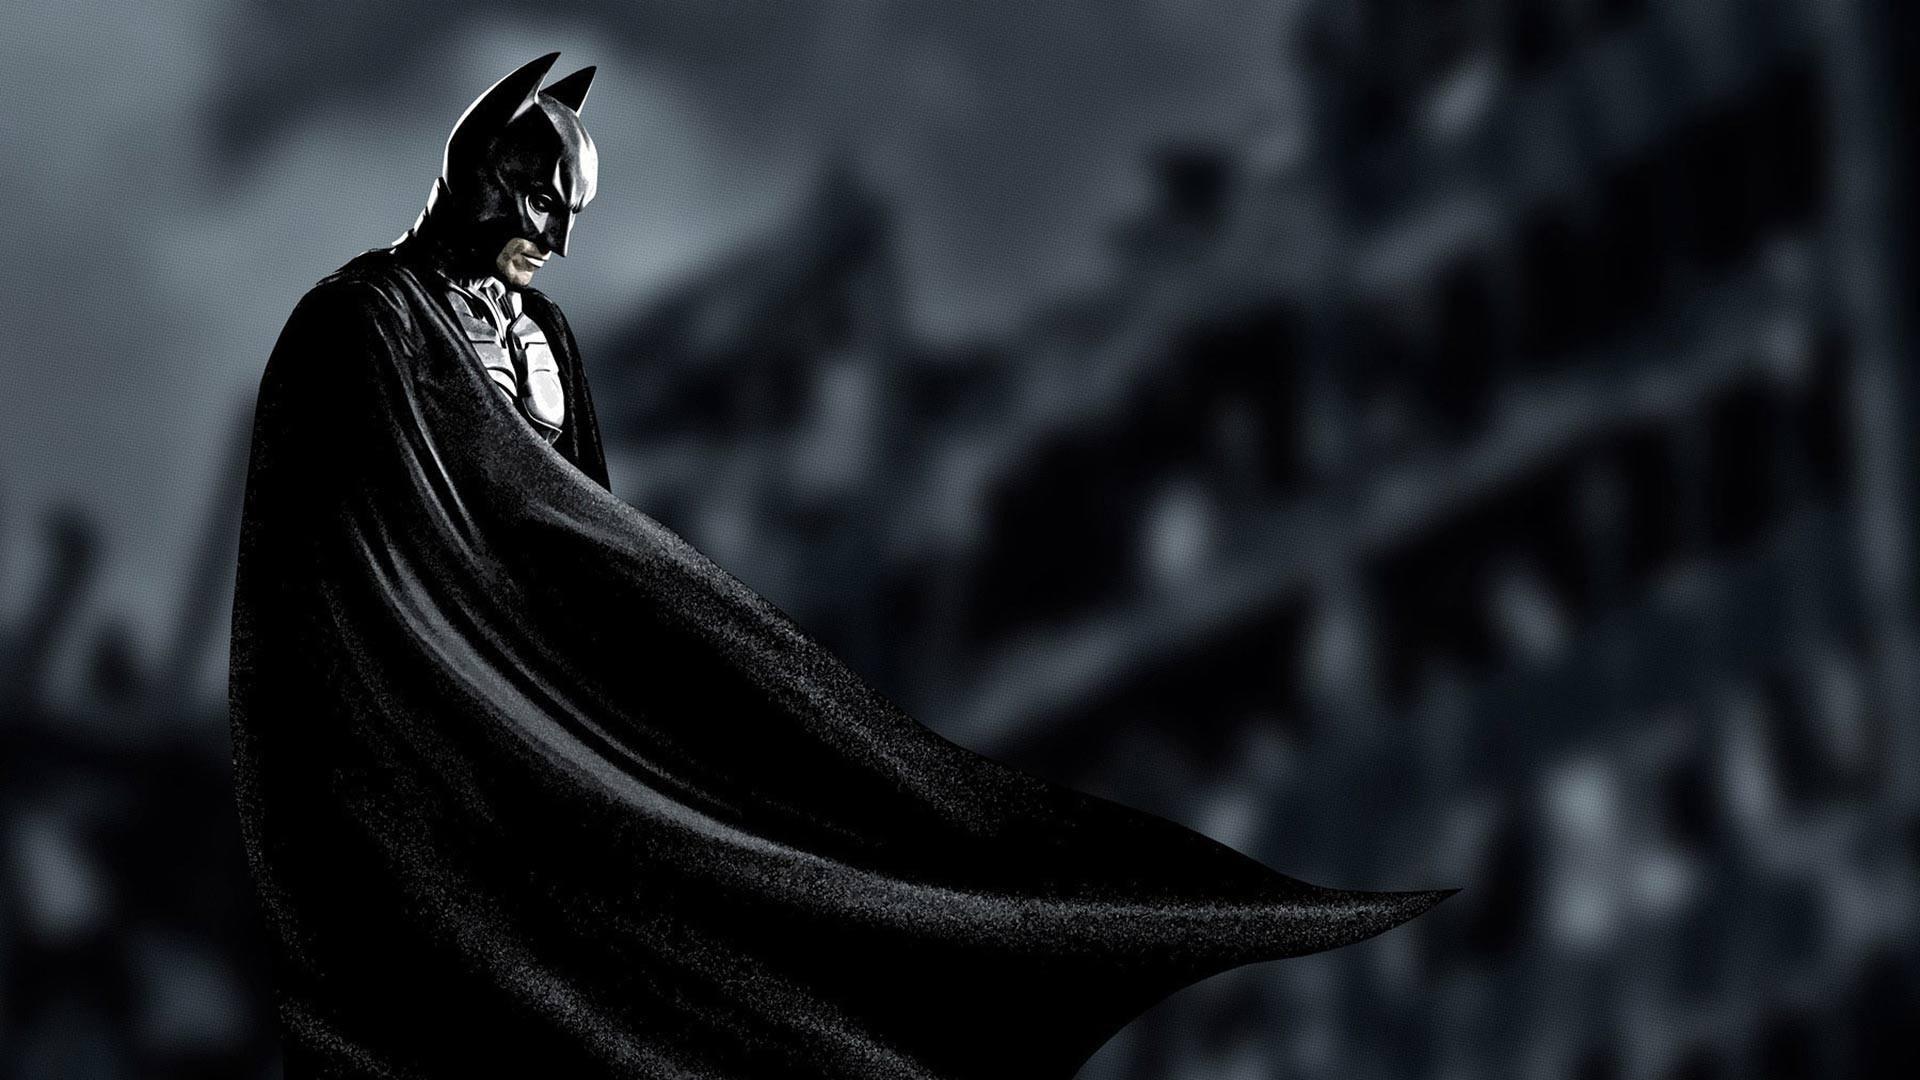 Batman, Movies, DC Comics Wallpapers HD / Desktop and Mobile Backgrounds